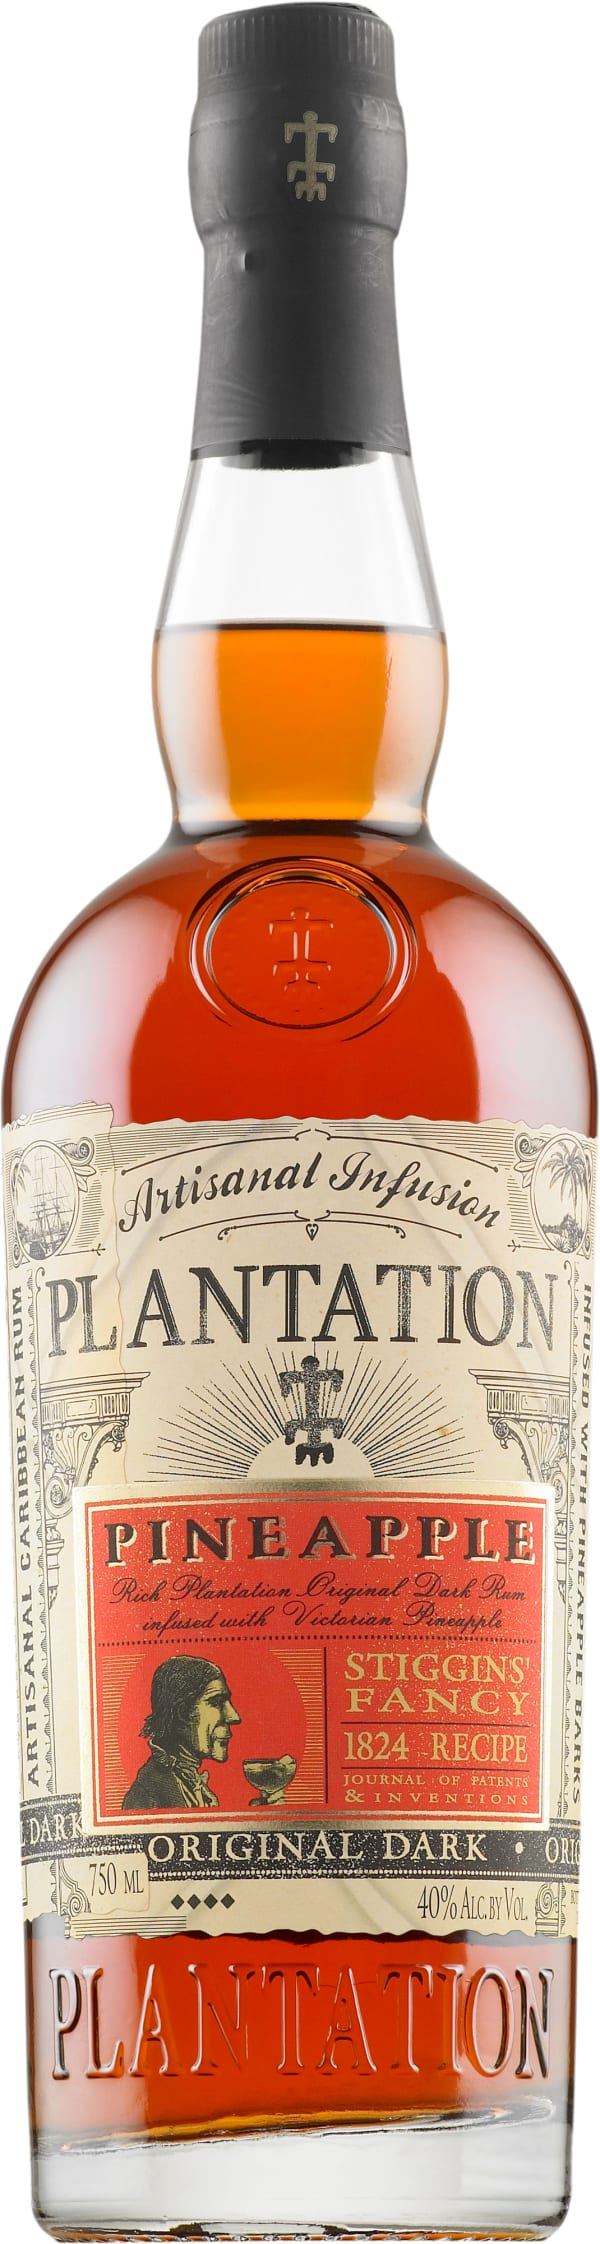 Plantation Original Dark Pineapple